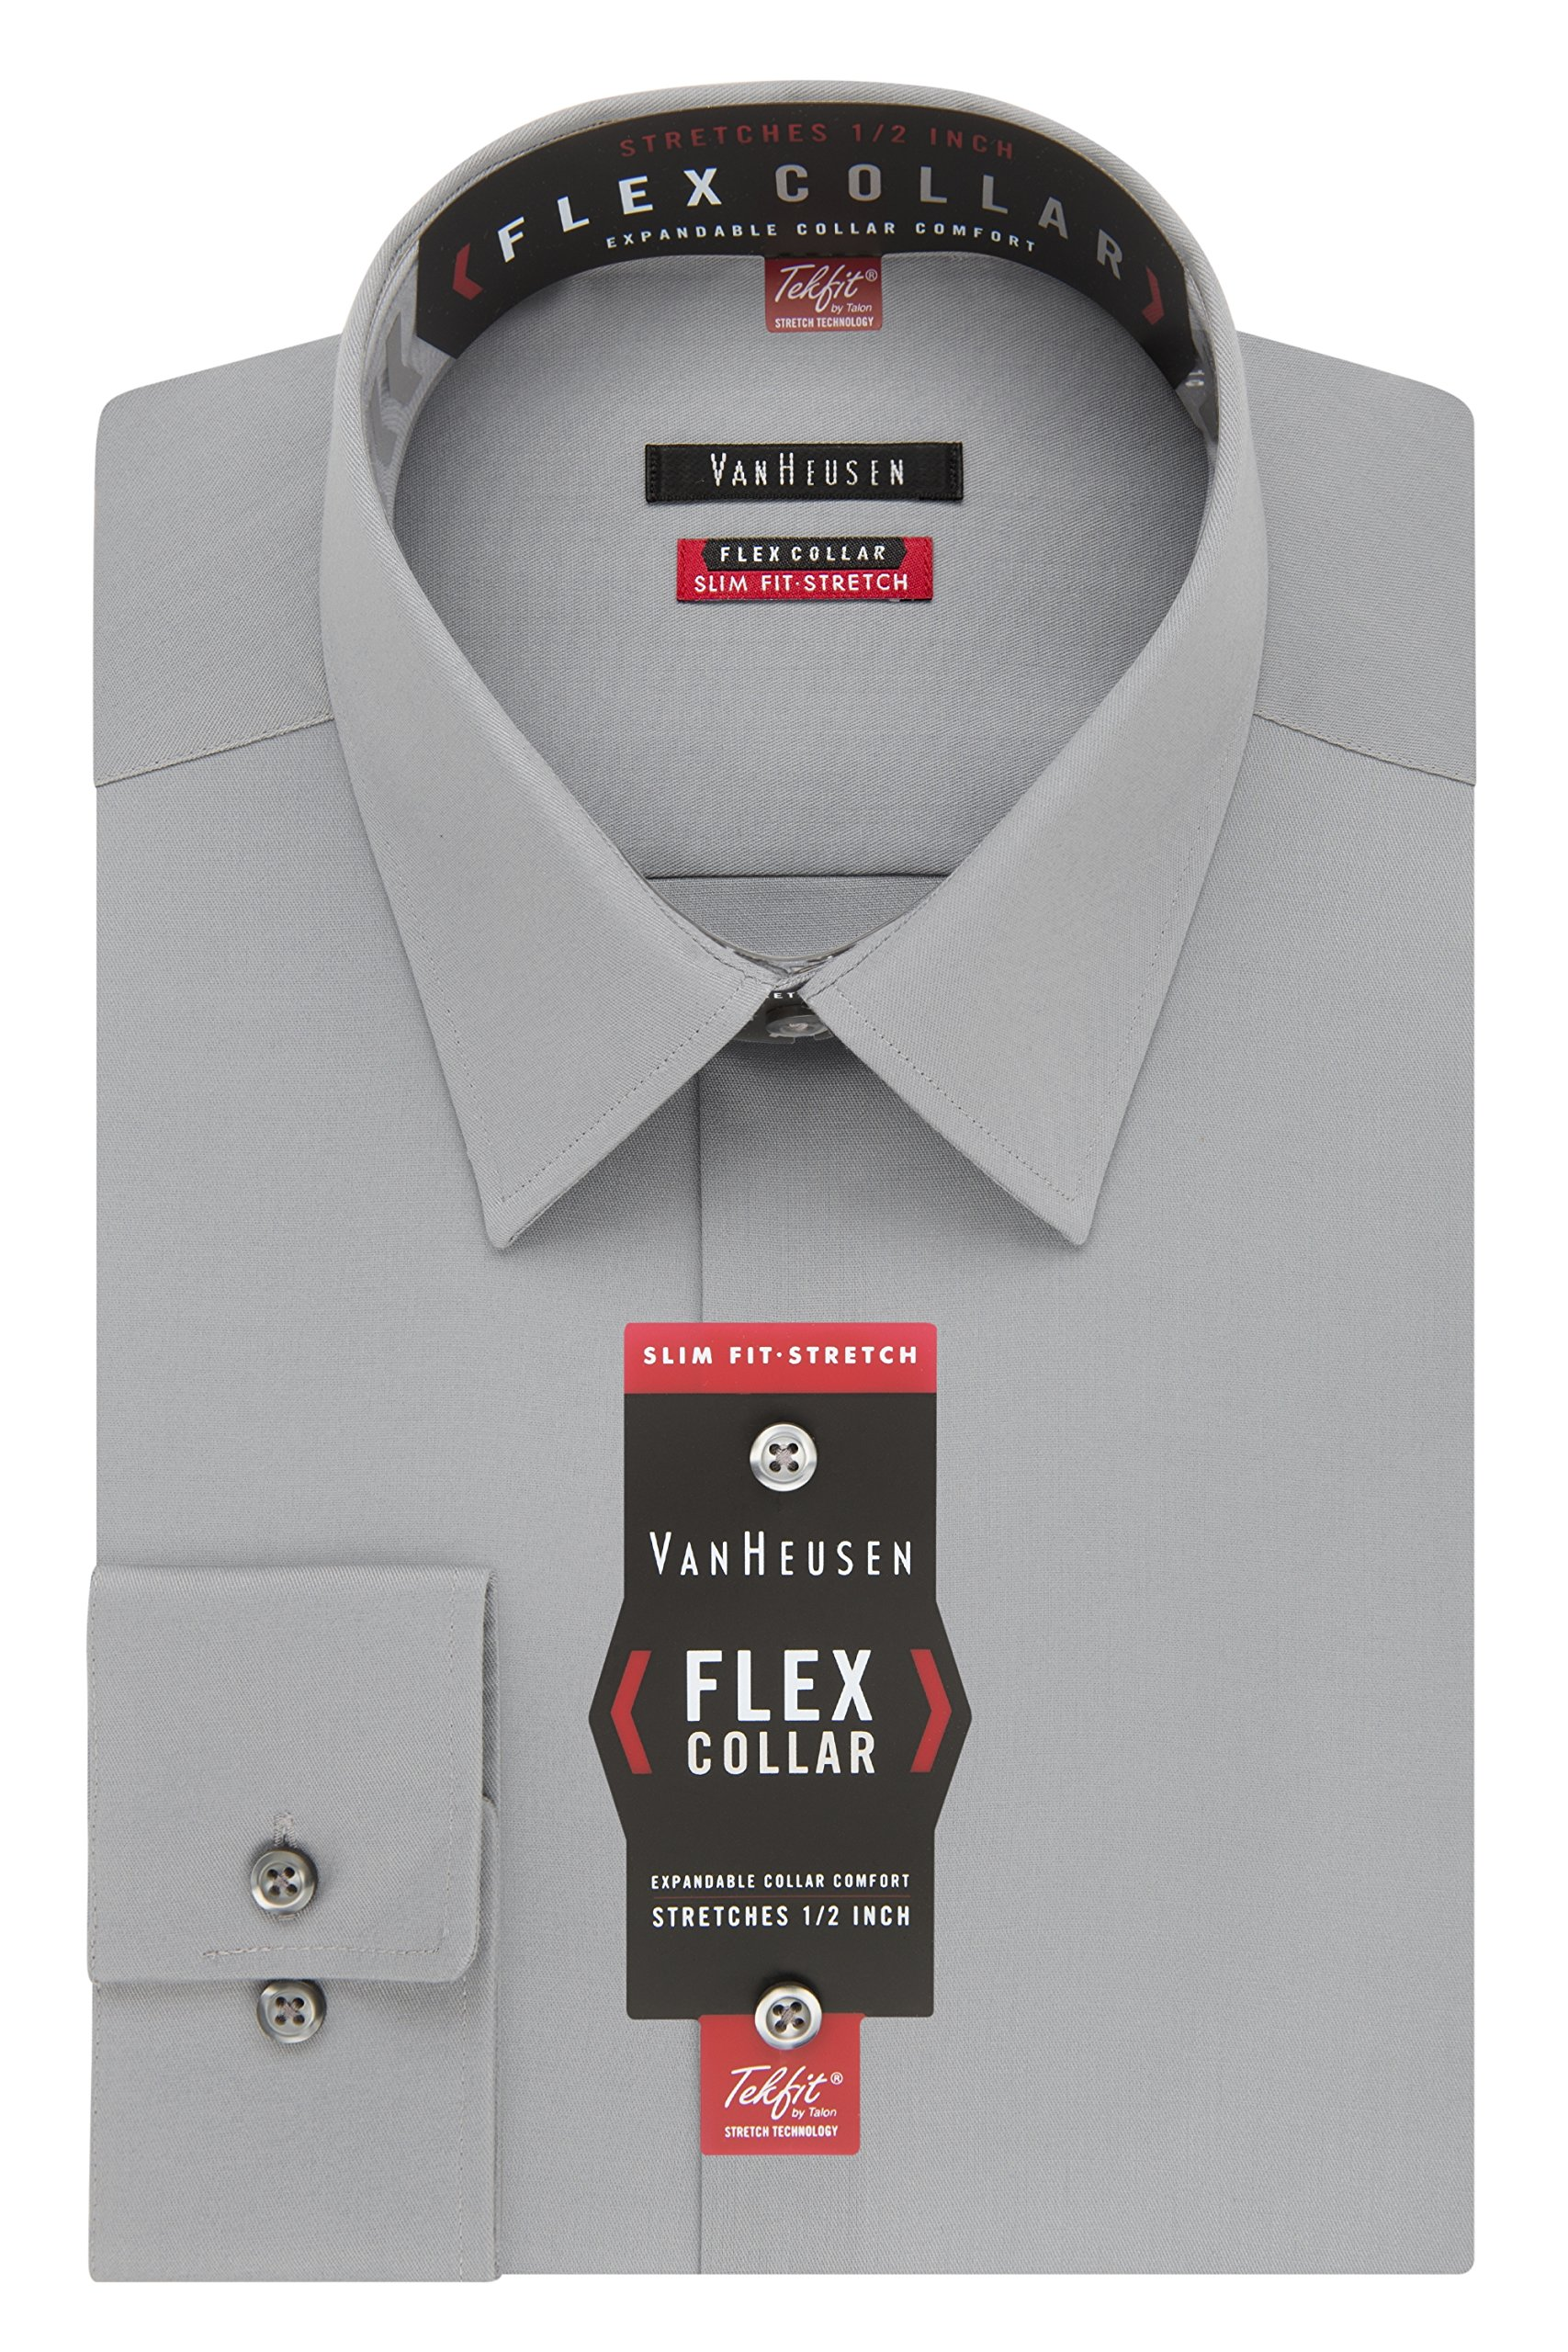 Van Heusen Men's Flex Collar Slim Fit Stretch Dress Shirt, Grey Mist, 18'' Neck 34''-35'' Sleeve